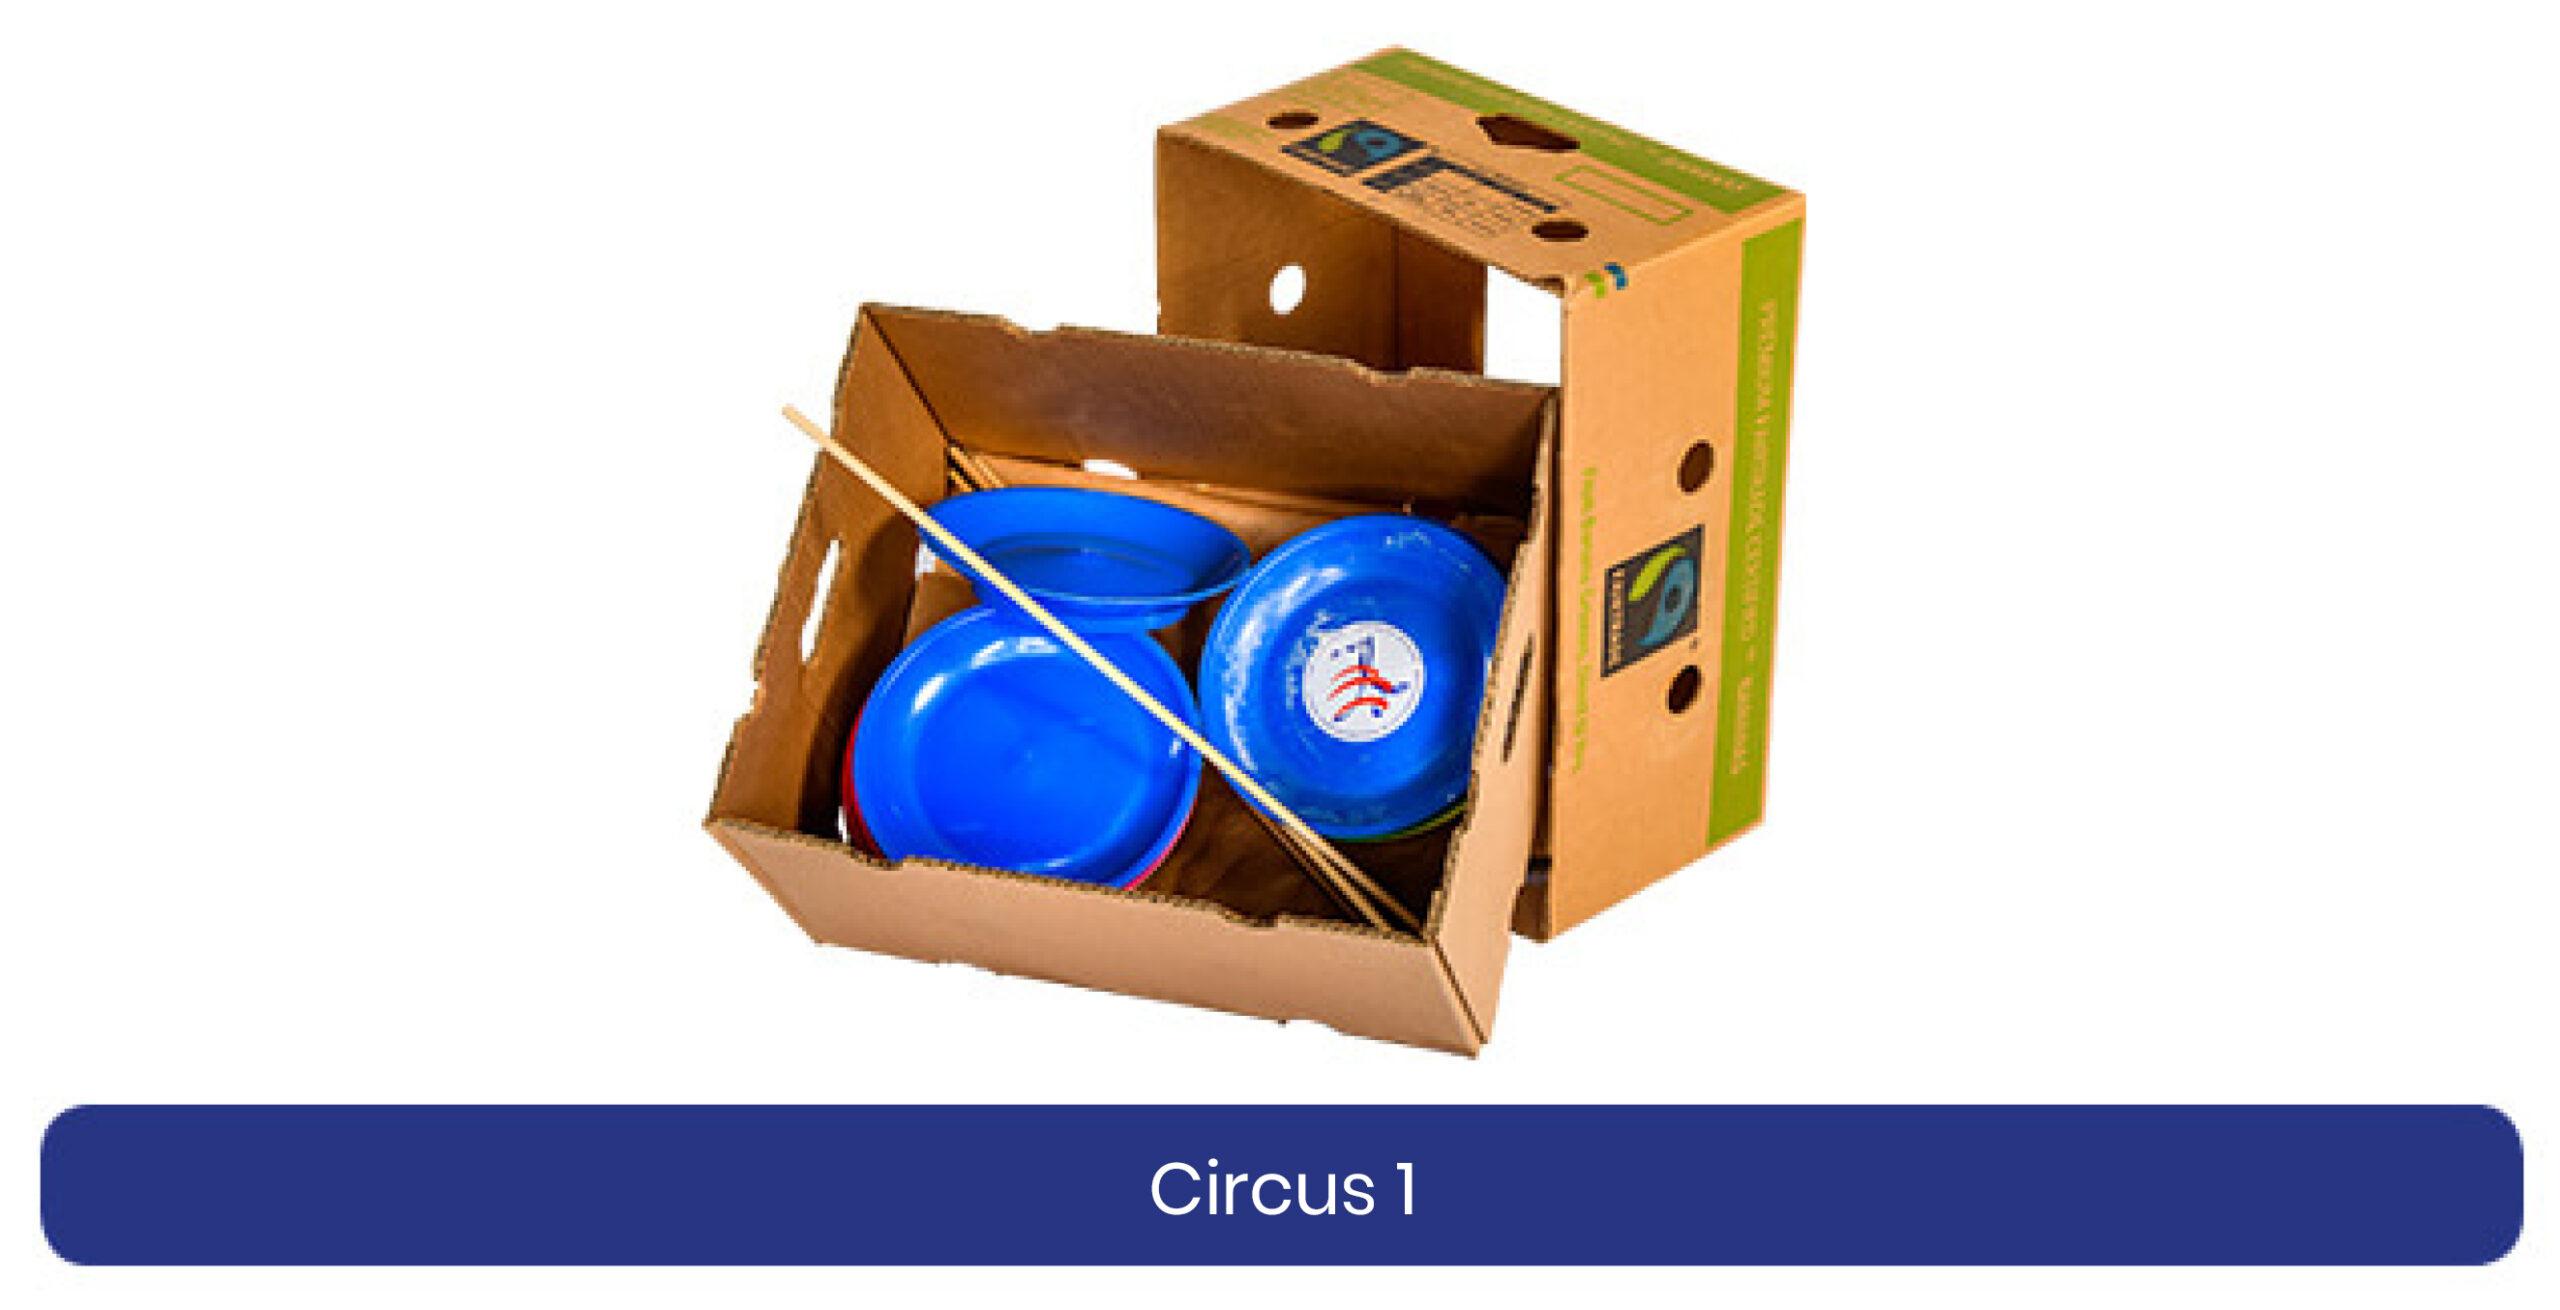 Circus 1 lenen product